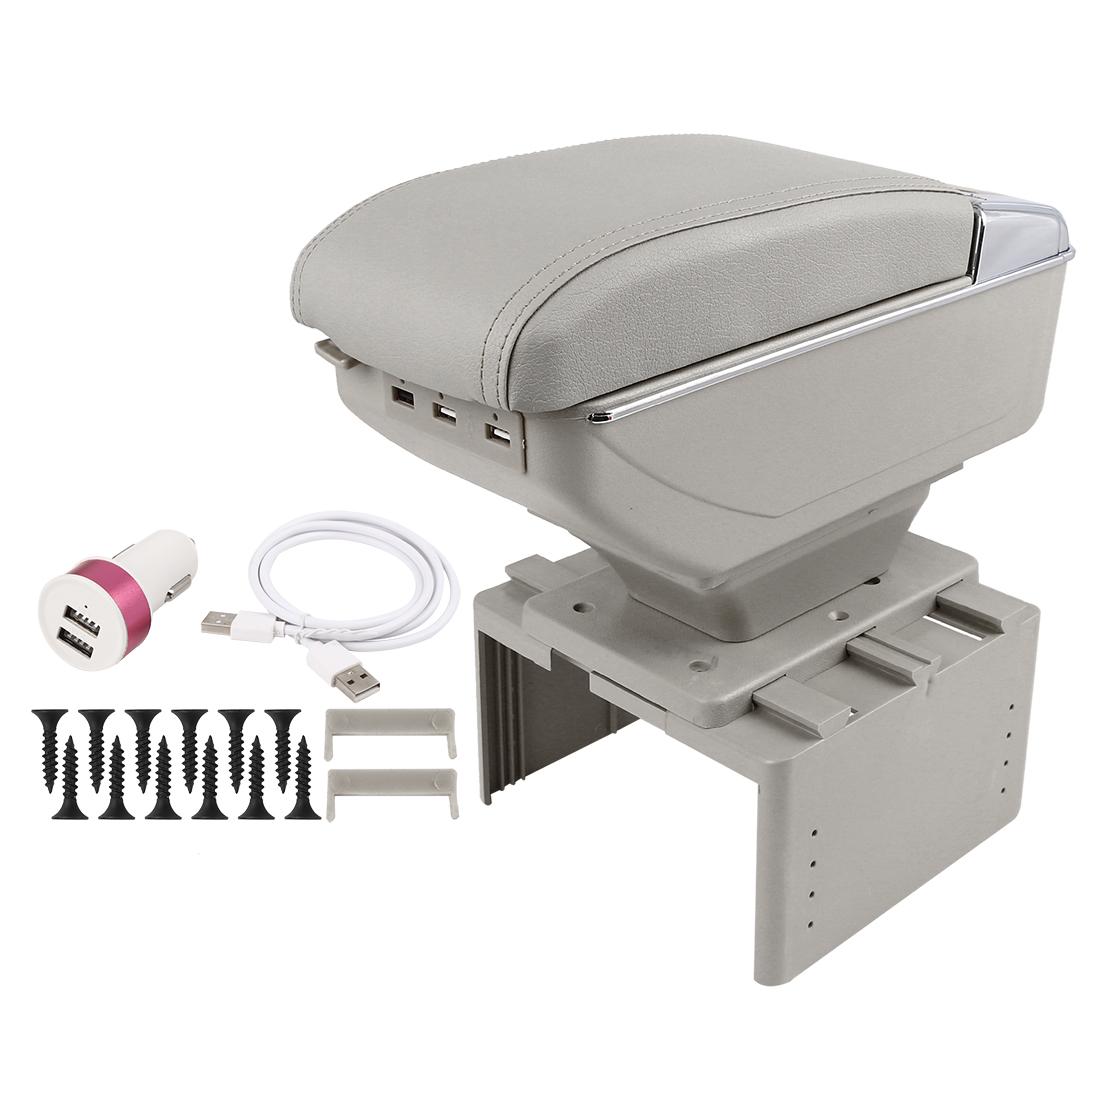 Universal Adjustable Double Layer Design Car Central Armrest Box w/ LED 7 USB